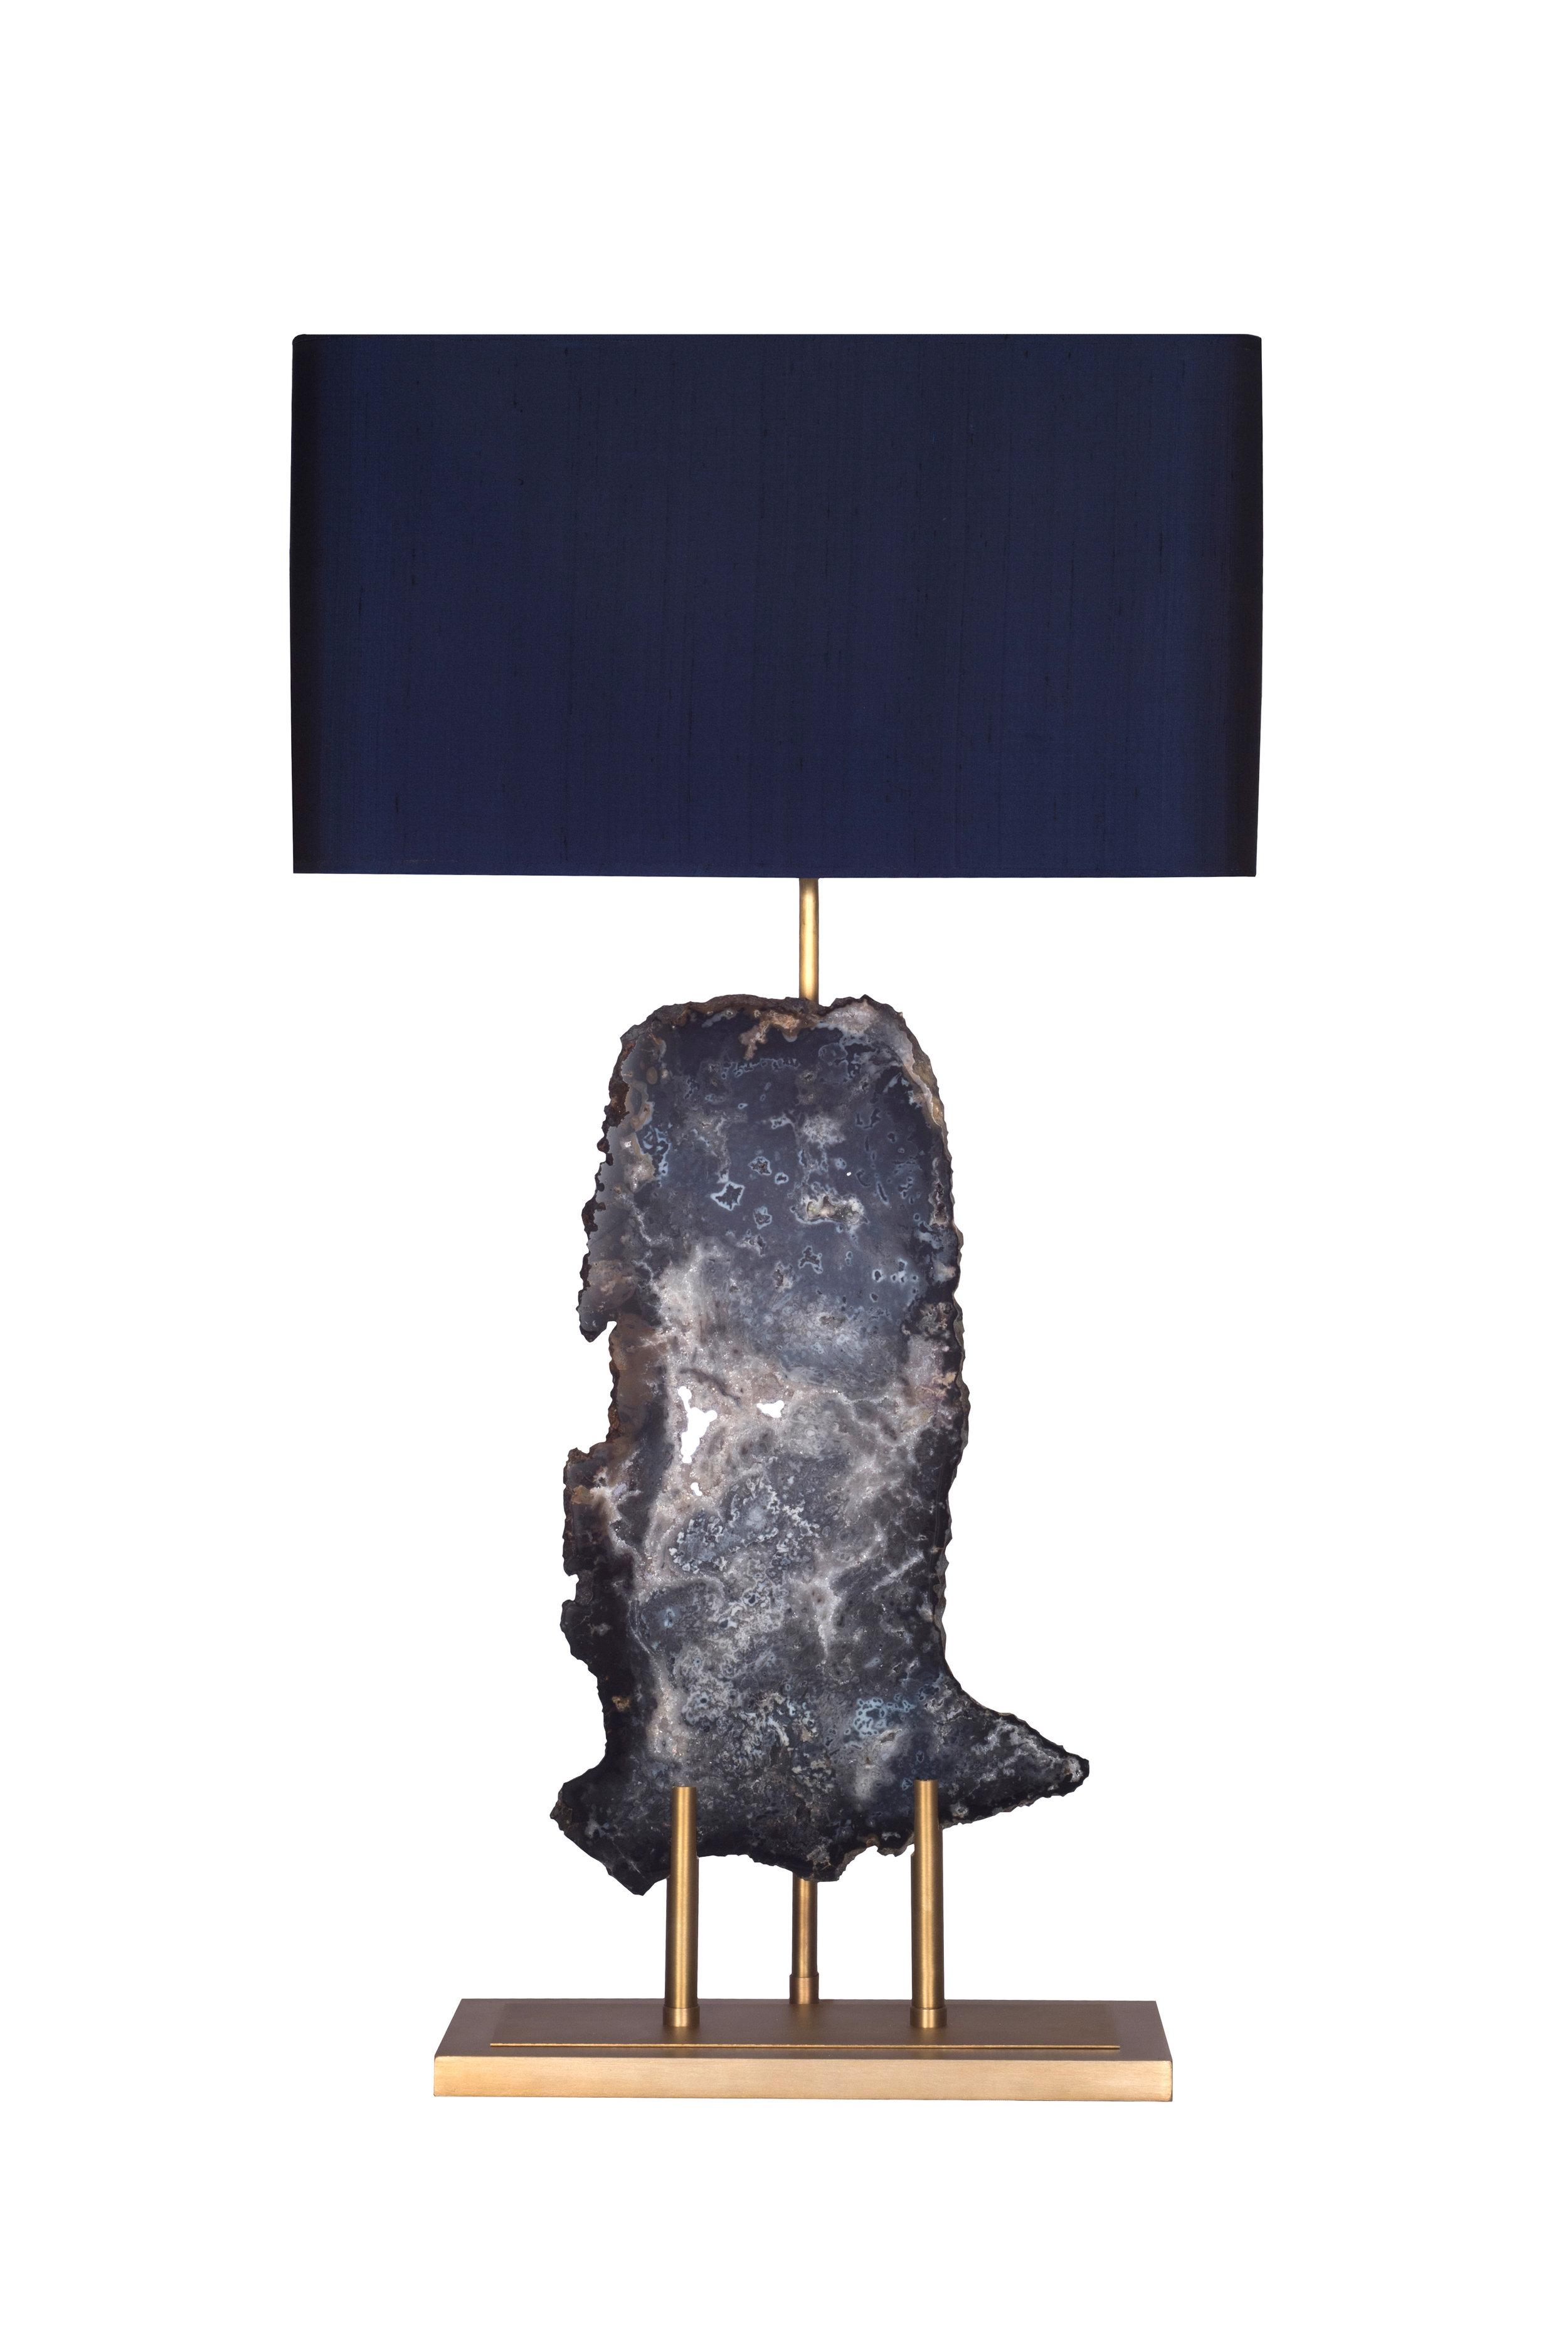 BAHIA - XL BLUE